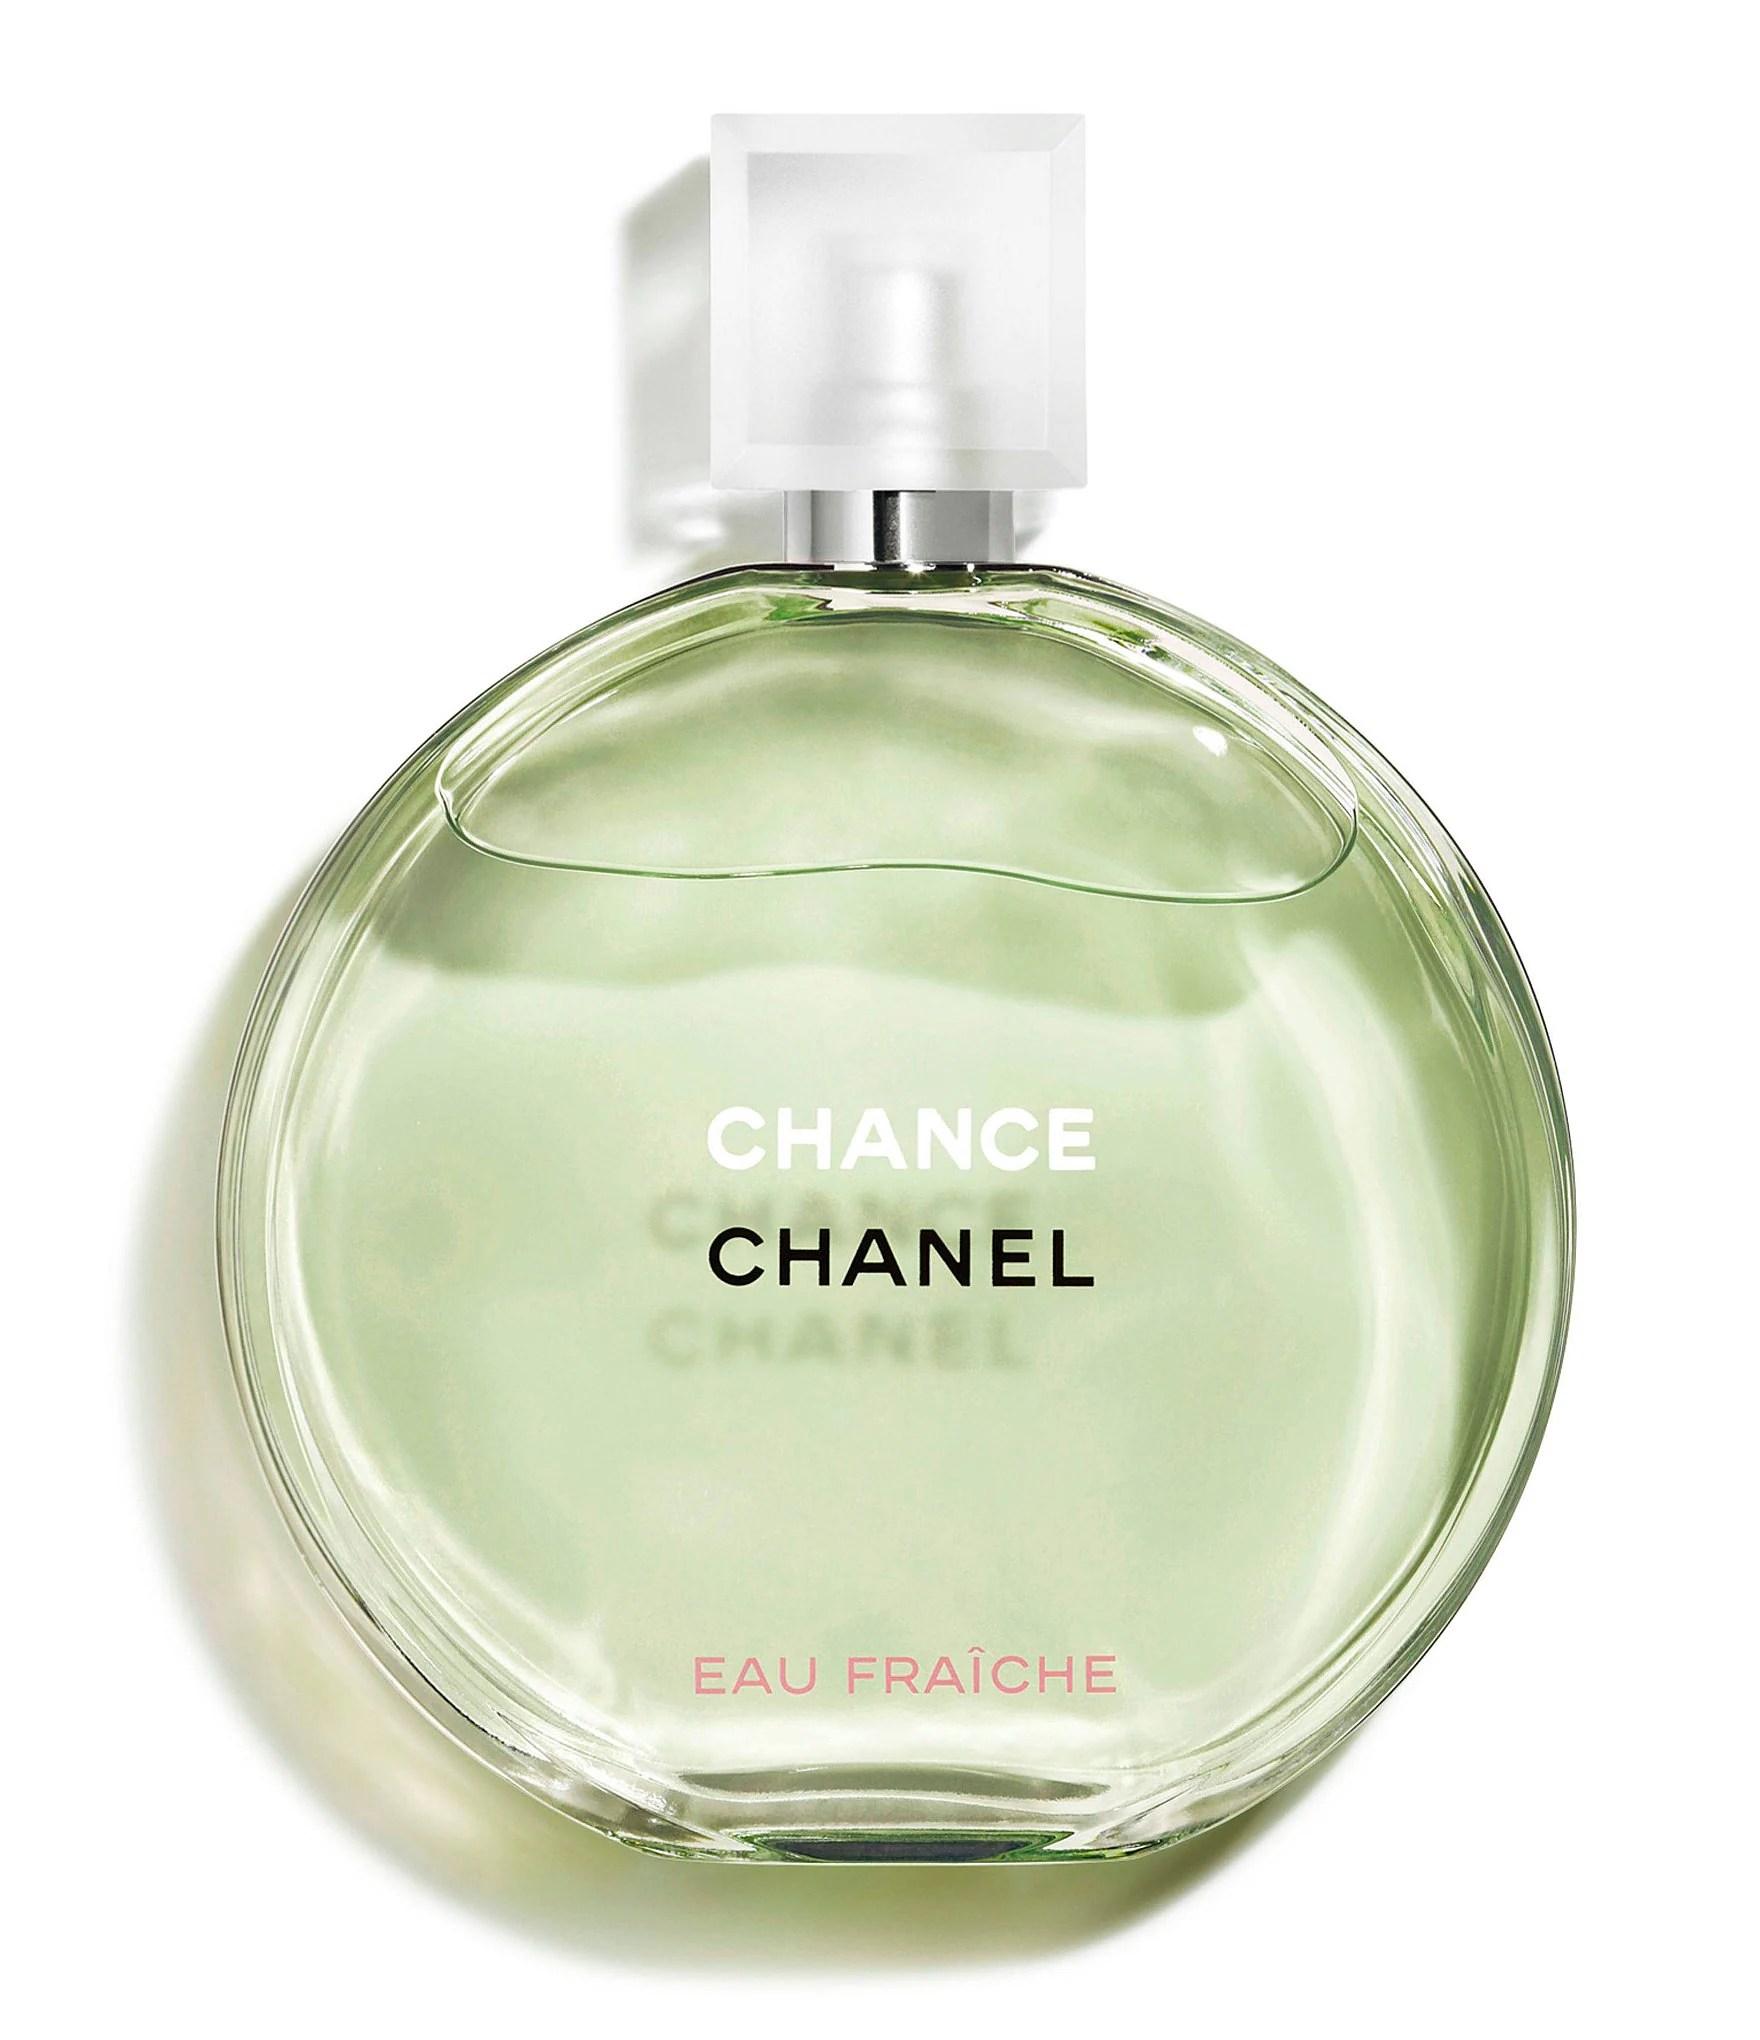 Chanel CHANEL CHANCE EAU FRACHE EAU DE TOILETTE SPRAY Dillards